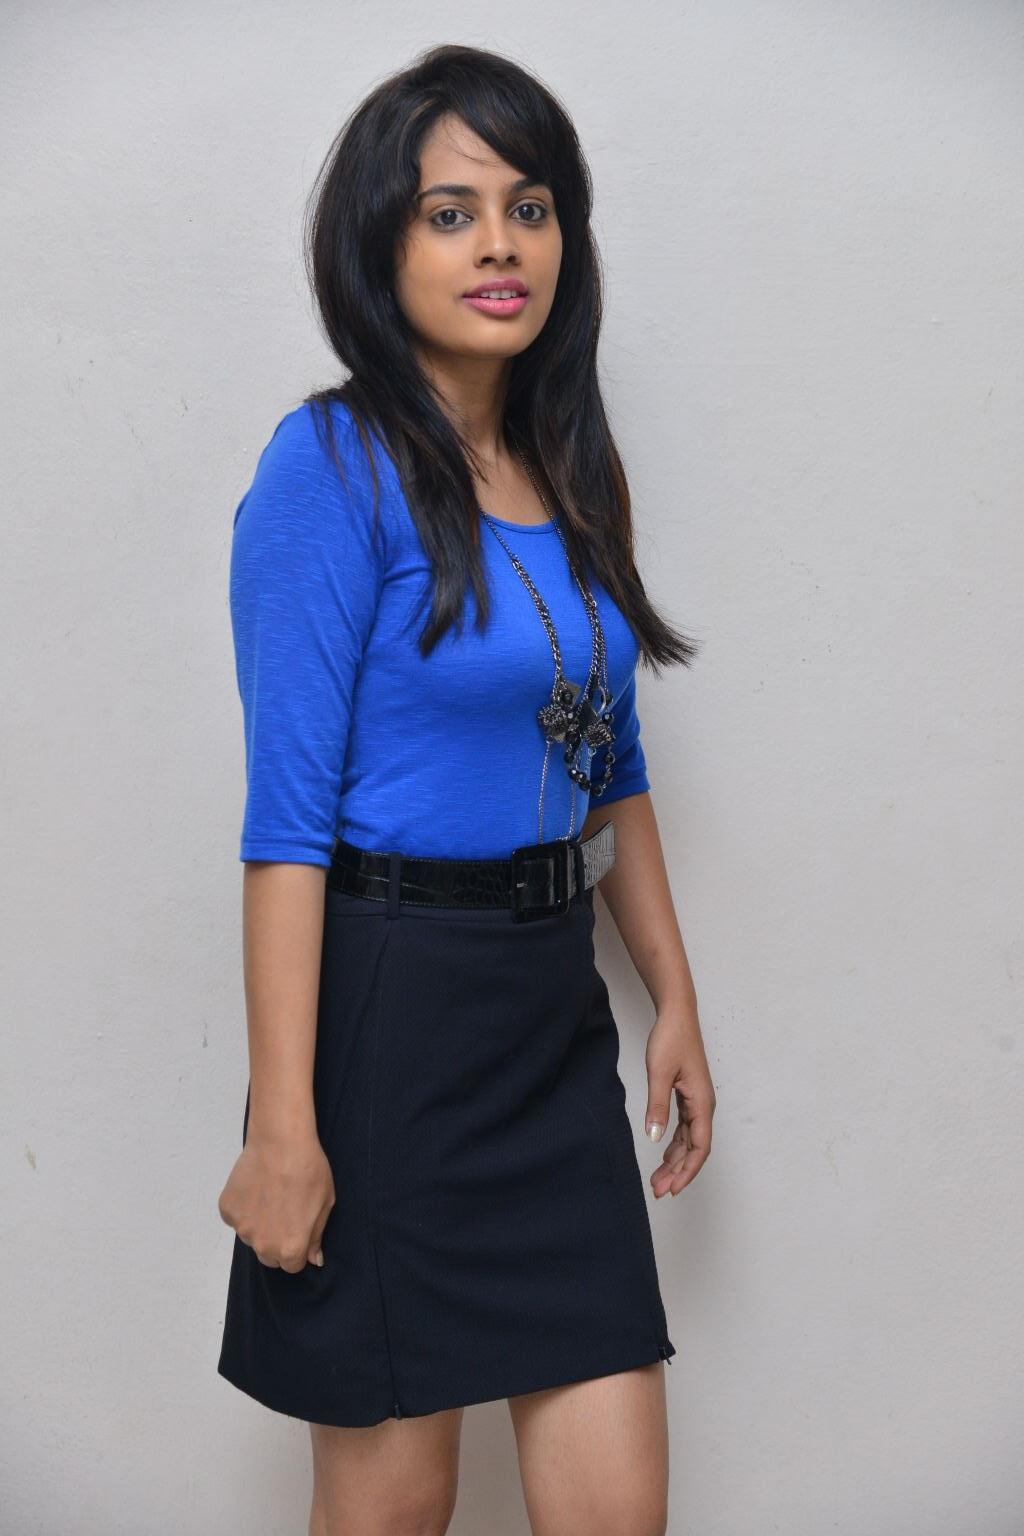 Nandita swtha sizzling in blue top-HQ-Photo-6